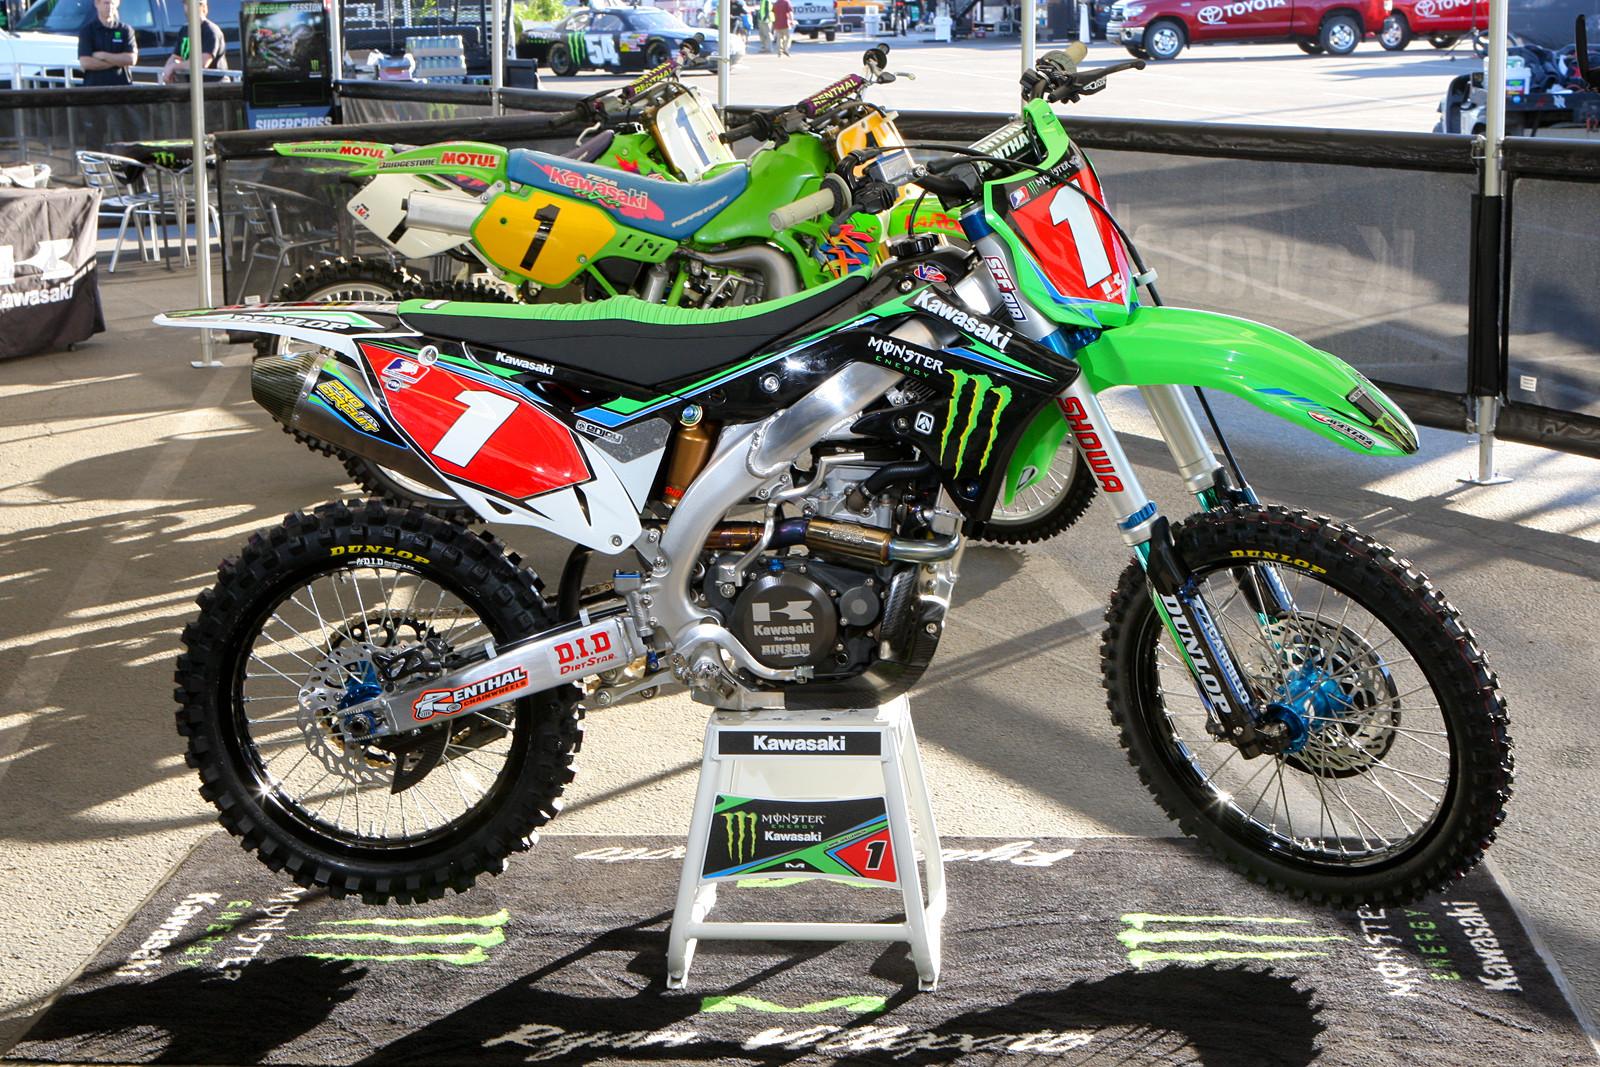 Ryan Villopoto - Bikes of Supercross 2013 - Motocross Pictures - Vital MX